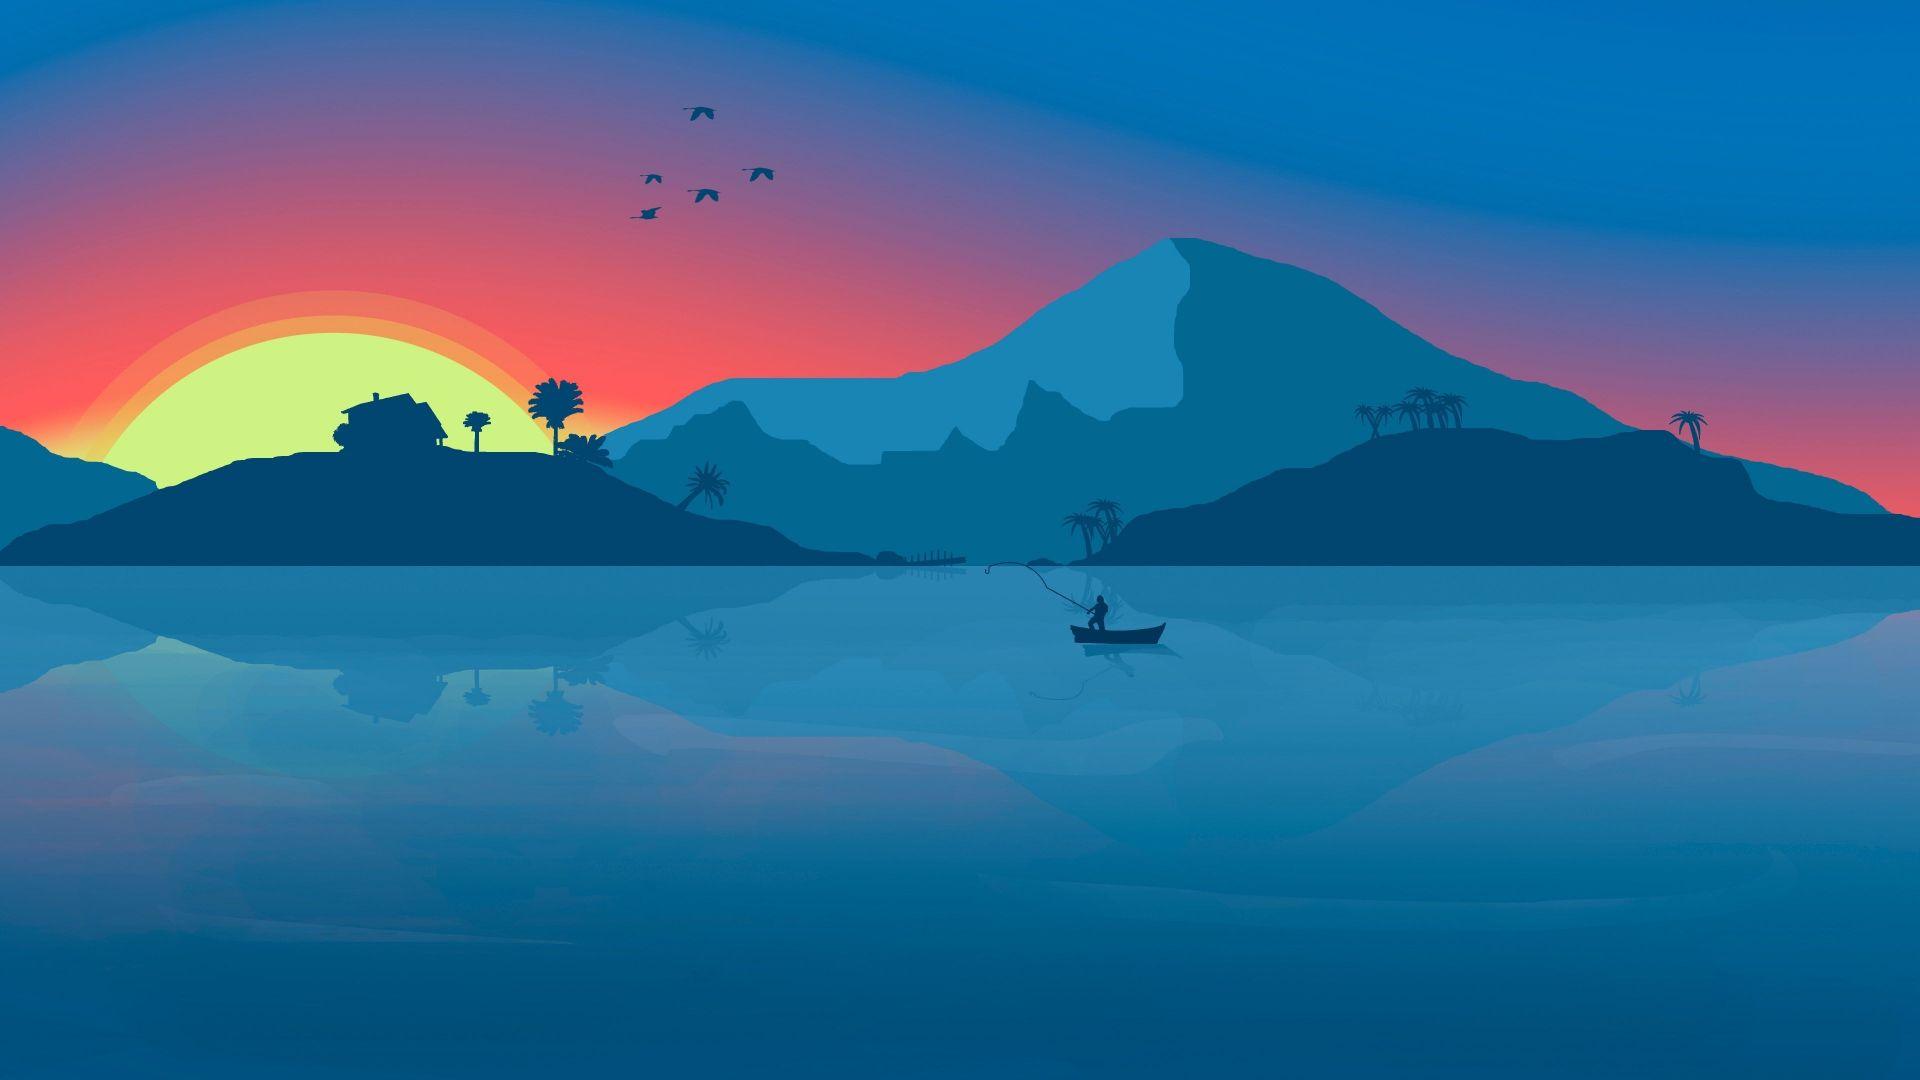 simple-sunset-wallpaper-1920x1080-wallpaper.jpg